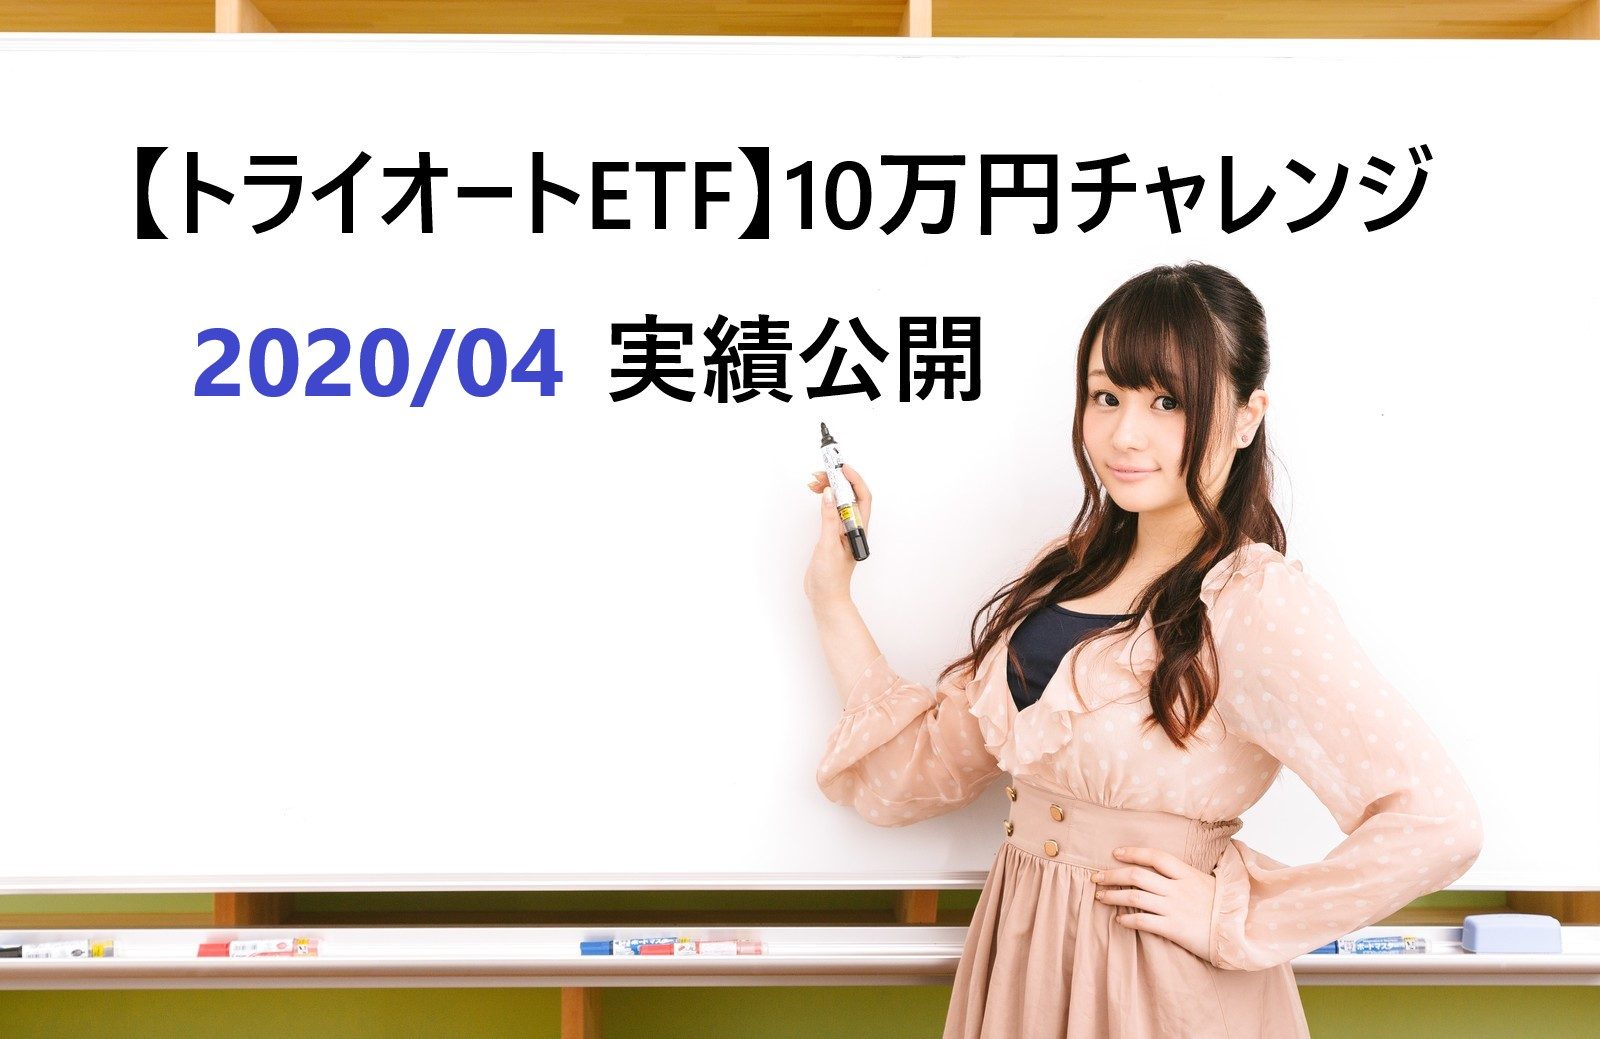 triauto-etf-challenge-202004